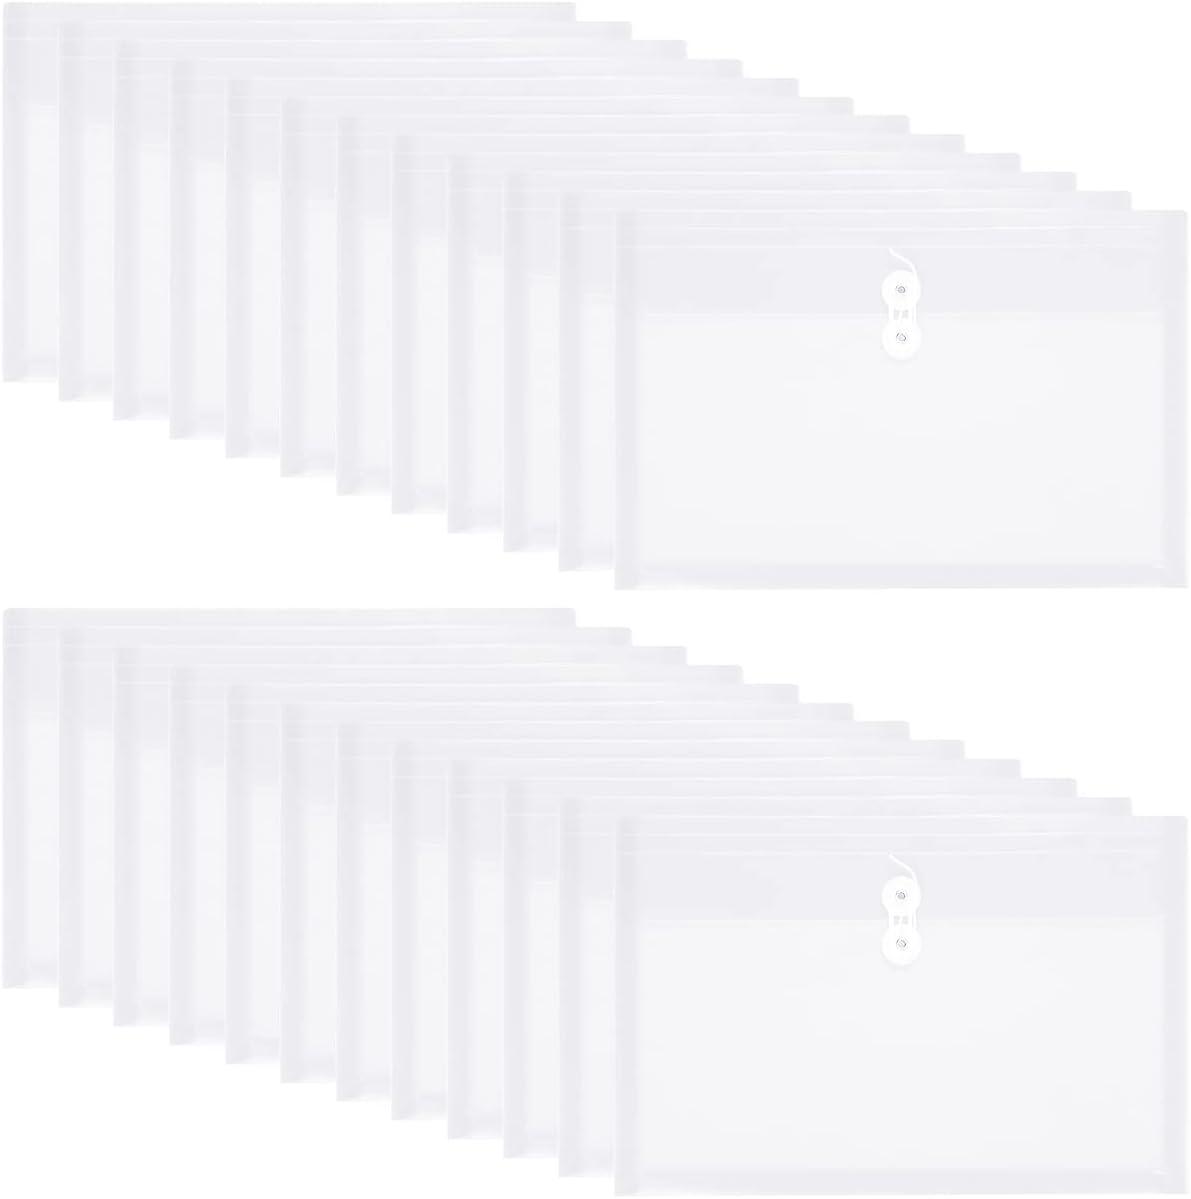 Yoeejob Plastic Envelopes Sacramento Mall Legal Size Closure with Tie String Regular discount Cl